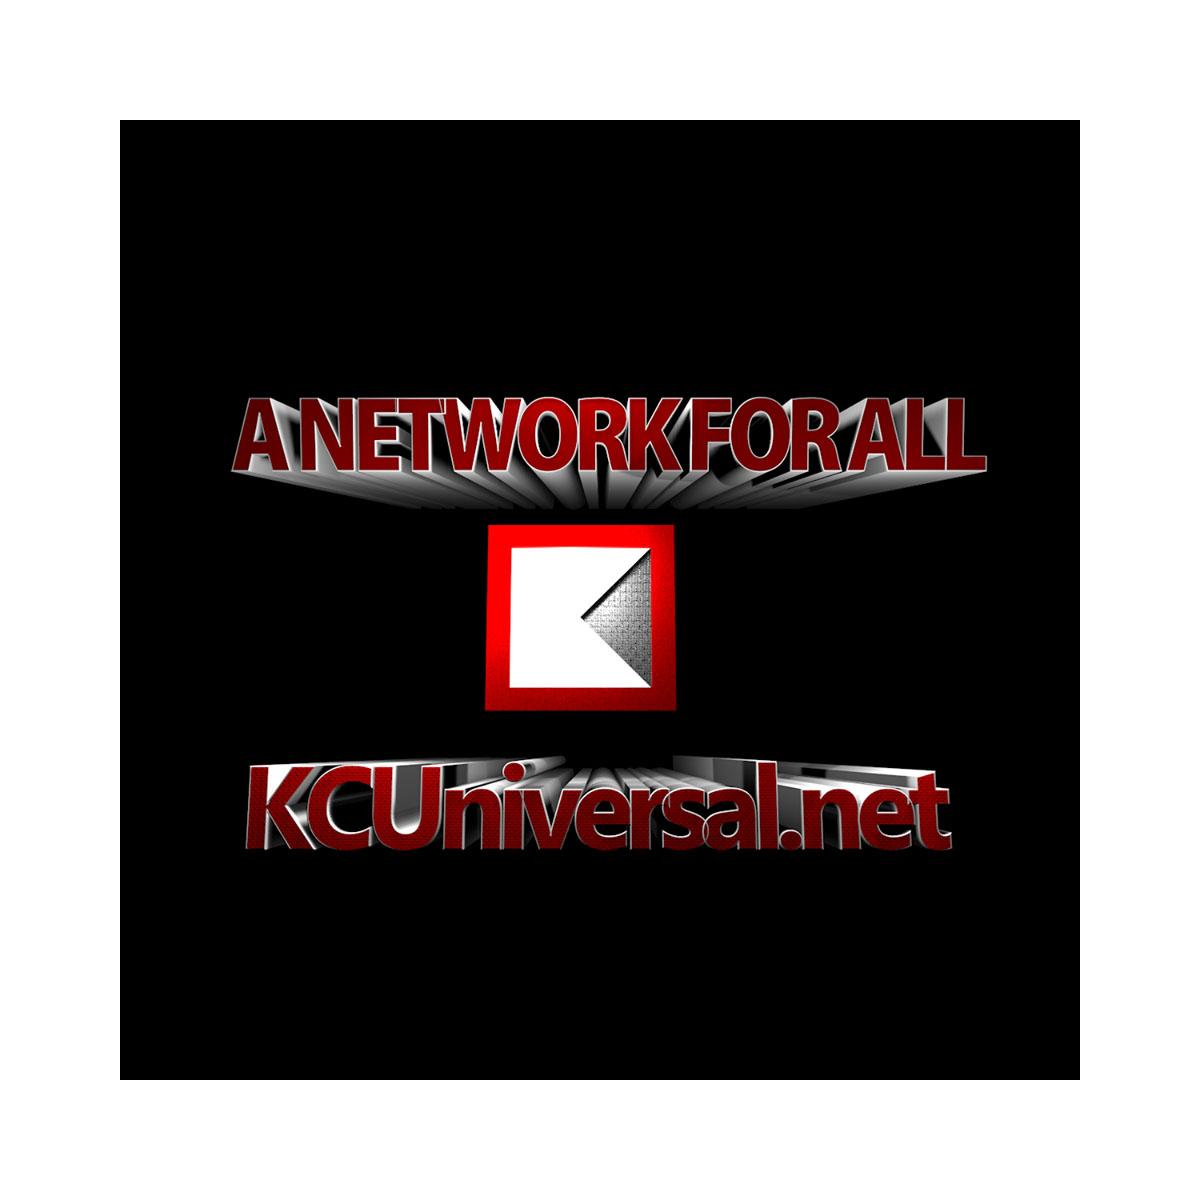 KC UNIVERSAL